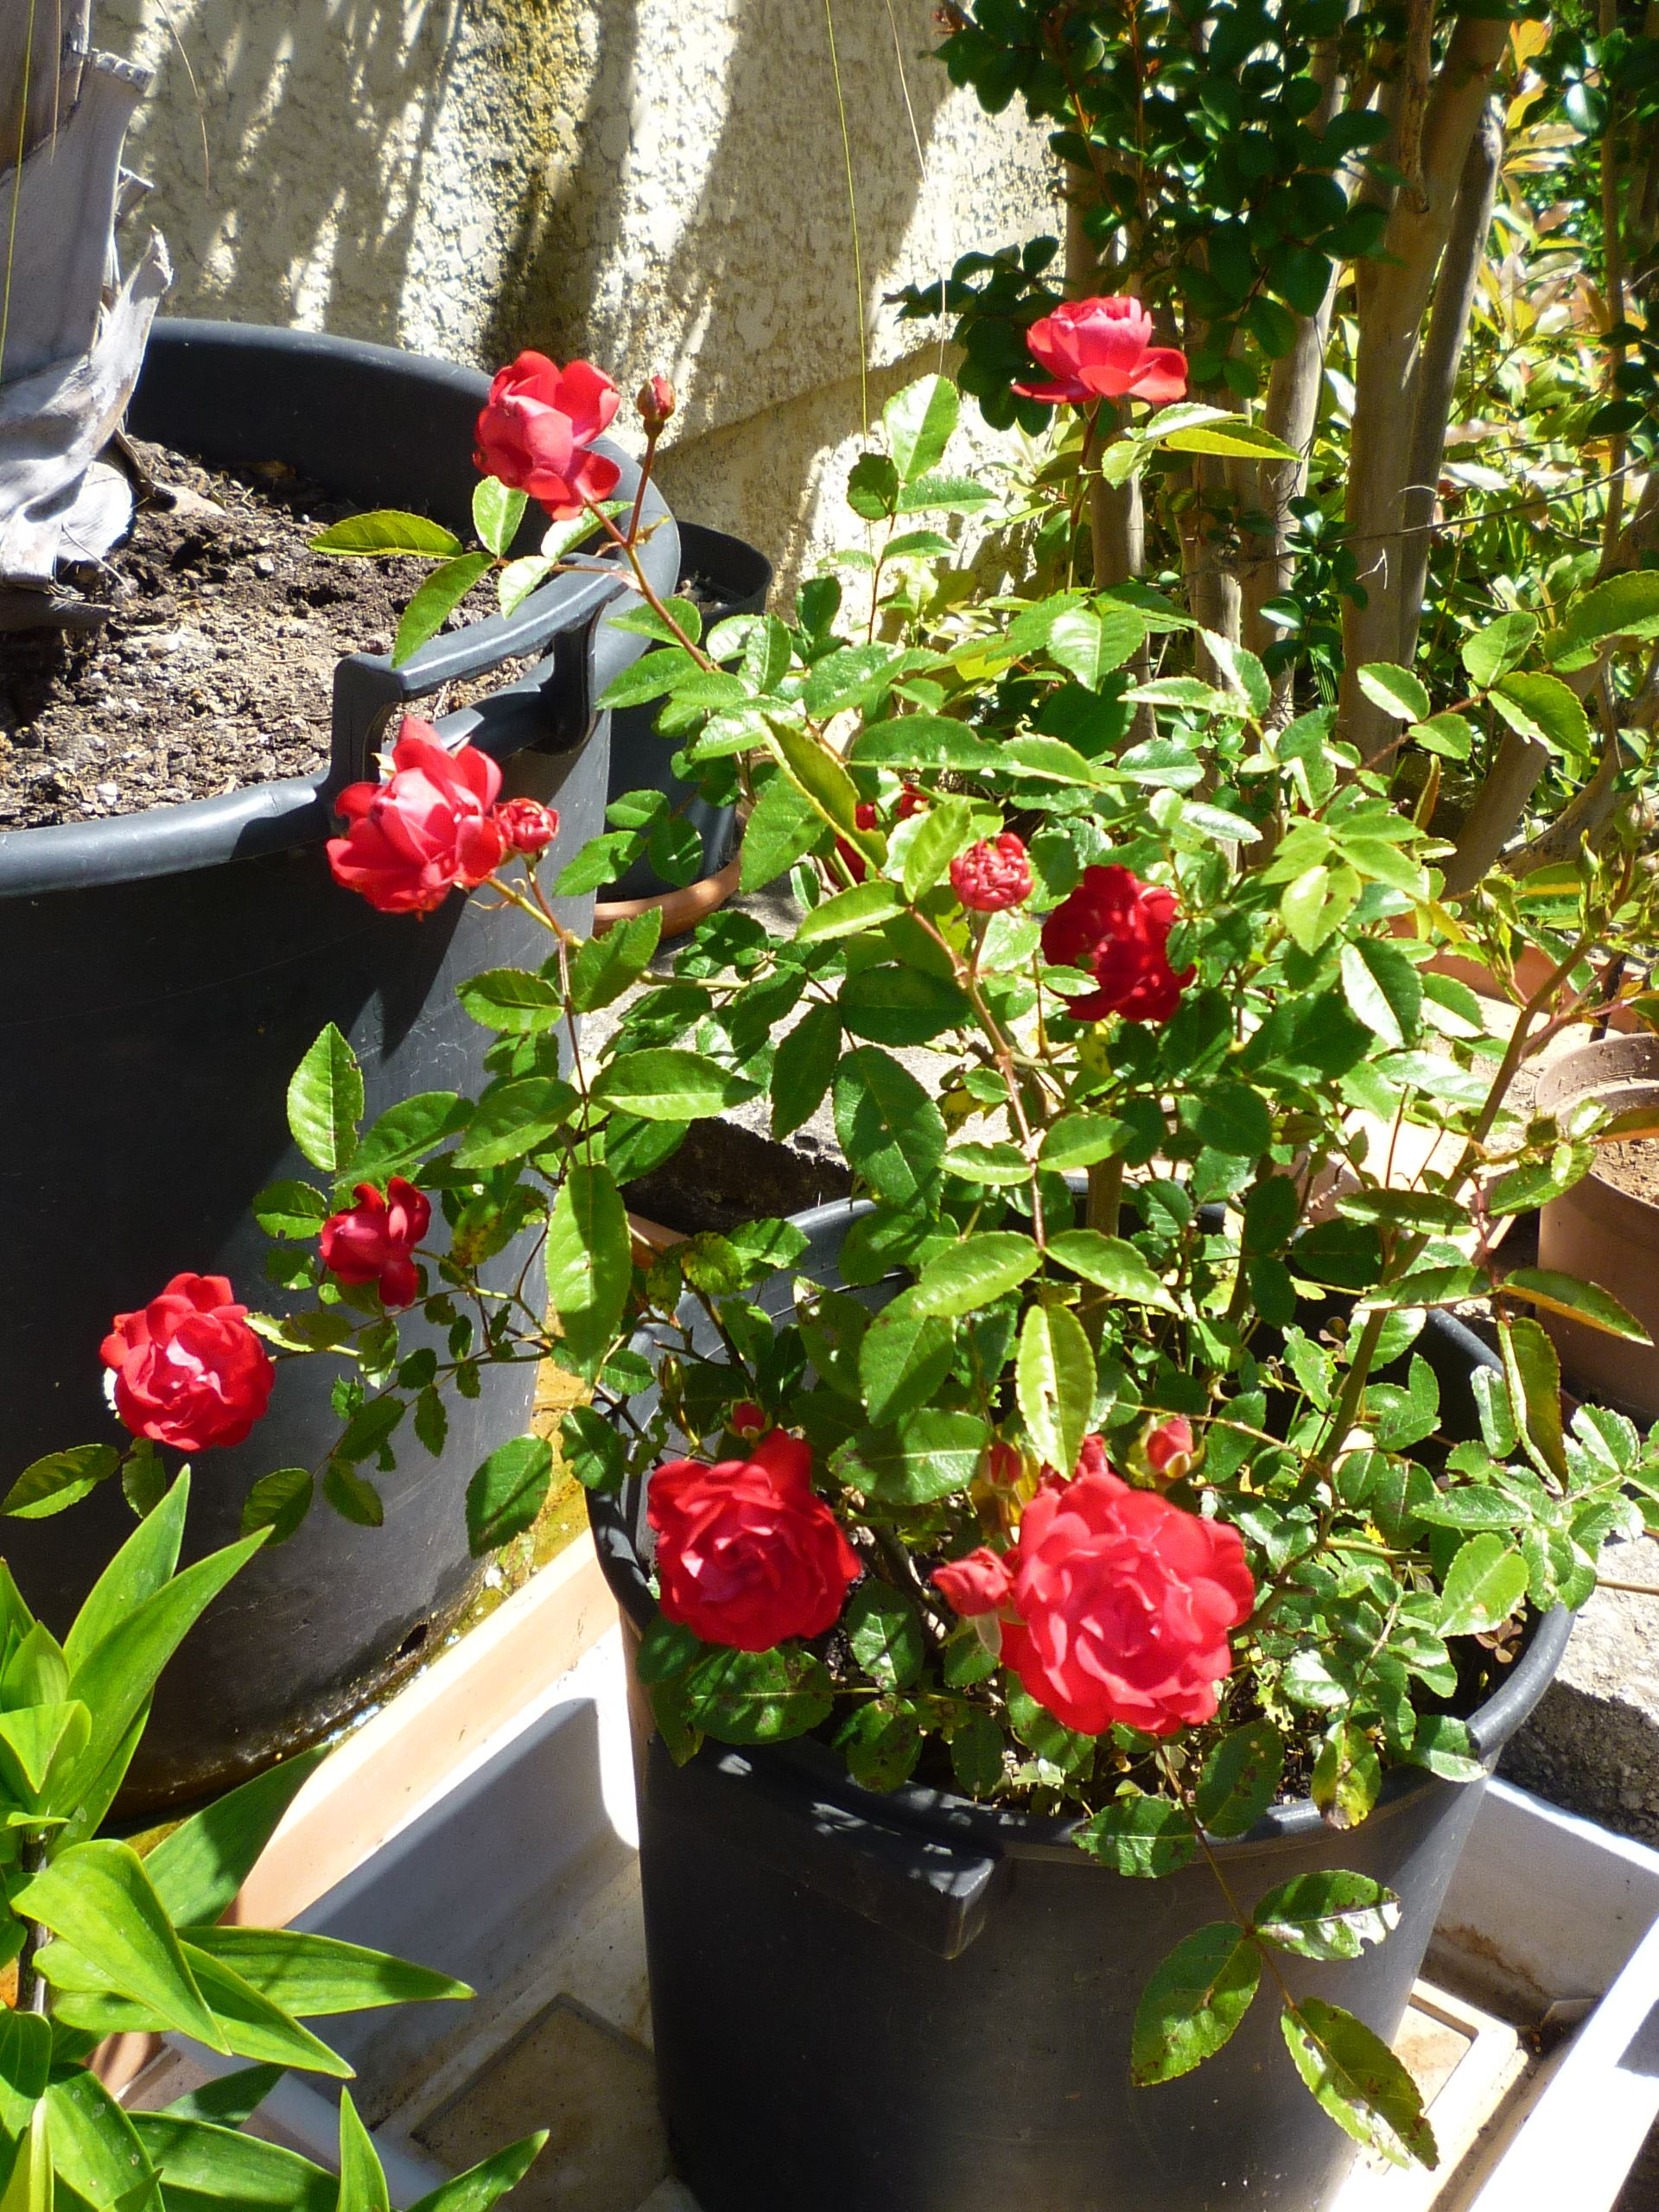 5b8e0dad3797c7c2abb68bc6cdaafaf4 Luxe De Fleurs De Jardin Des Idées